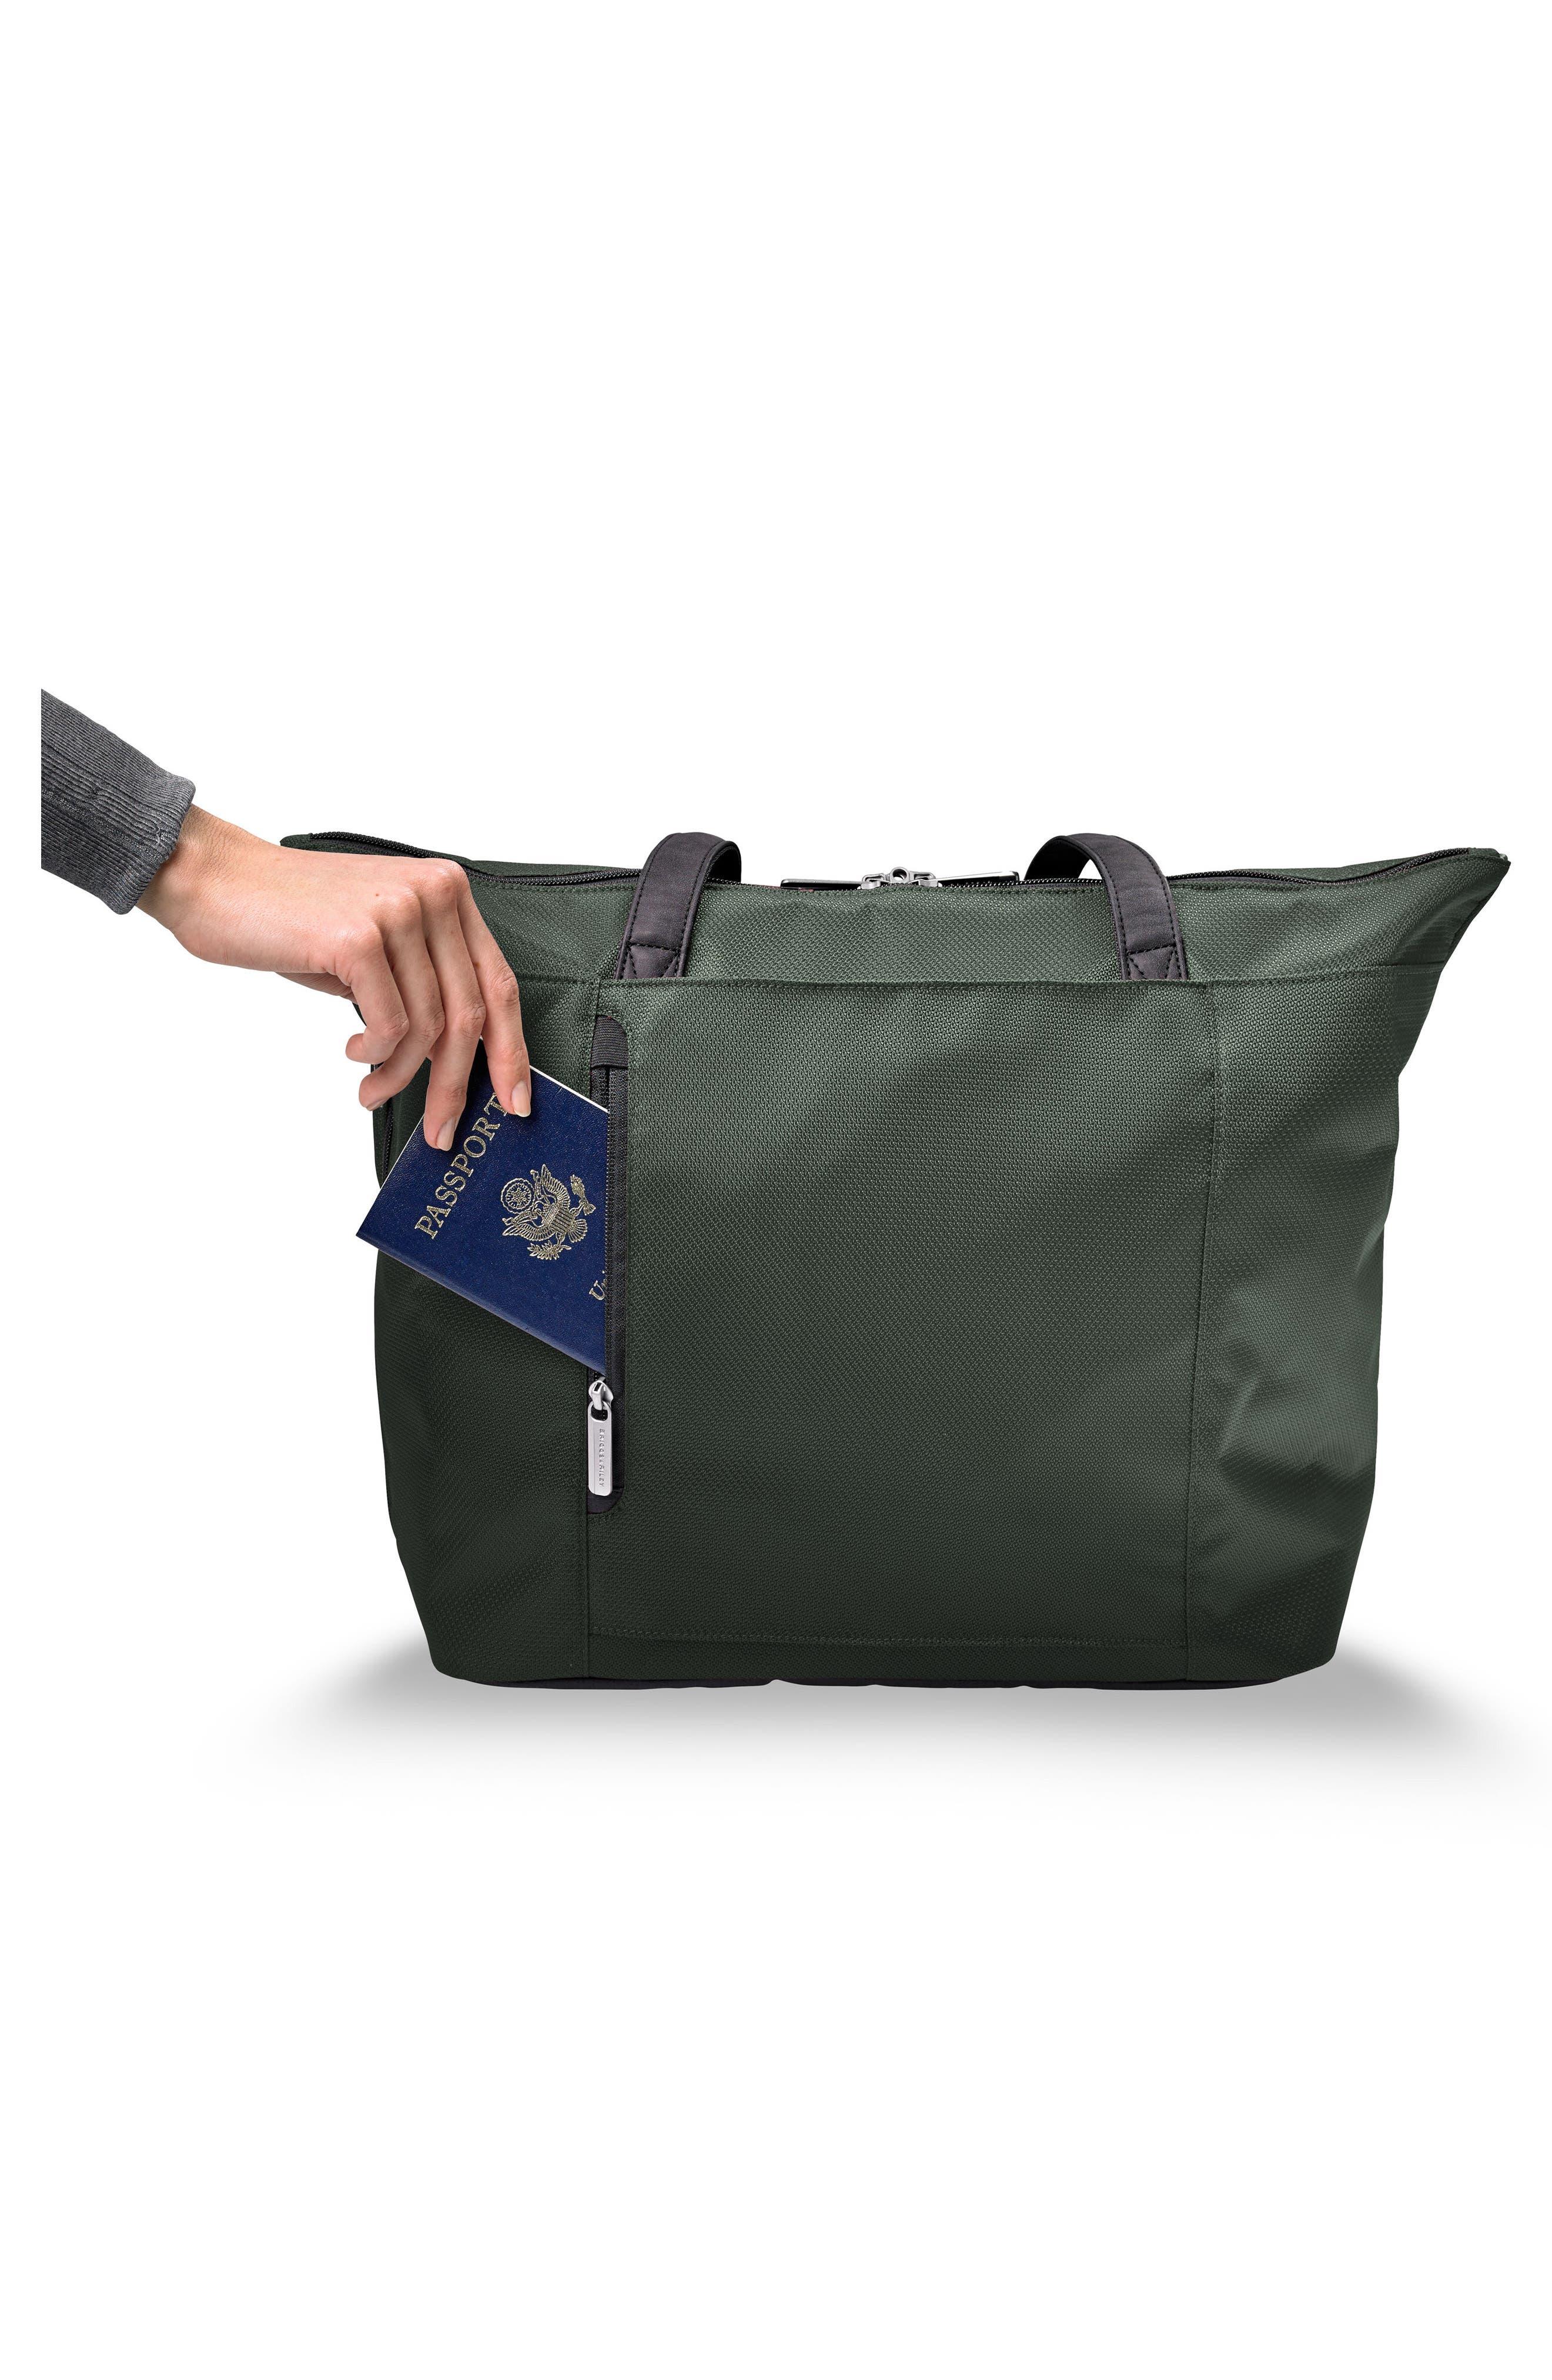 Transcend 400 Tote Bag,                             Alternate thumbnail 6, color,                             Rainforest Green